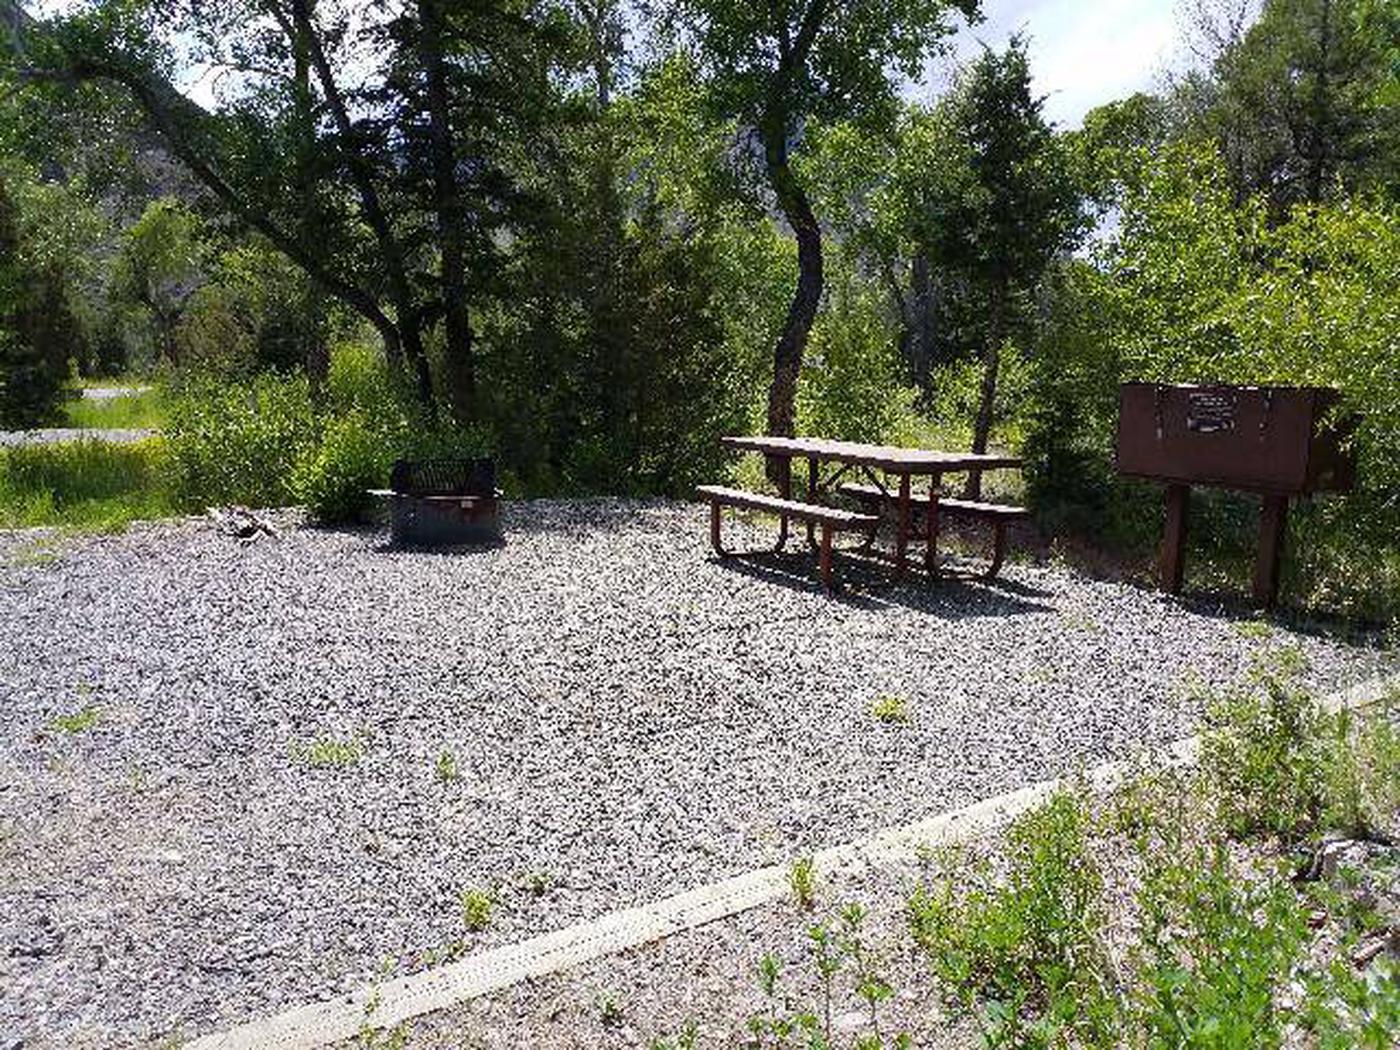 Wapiti Campsite 6 - Picnic Area